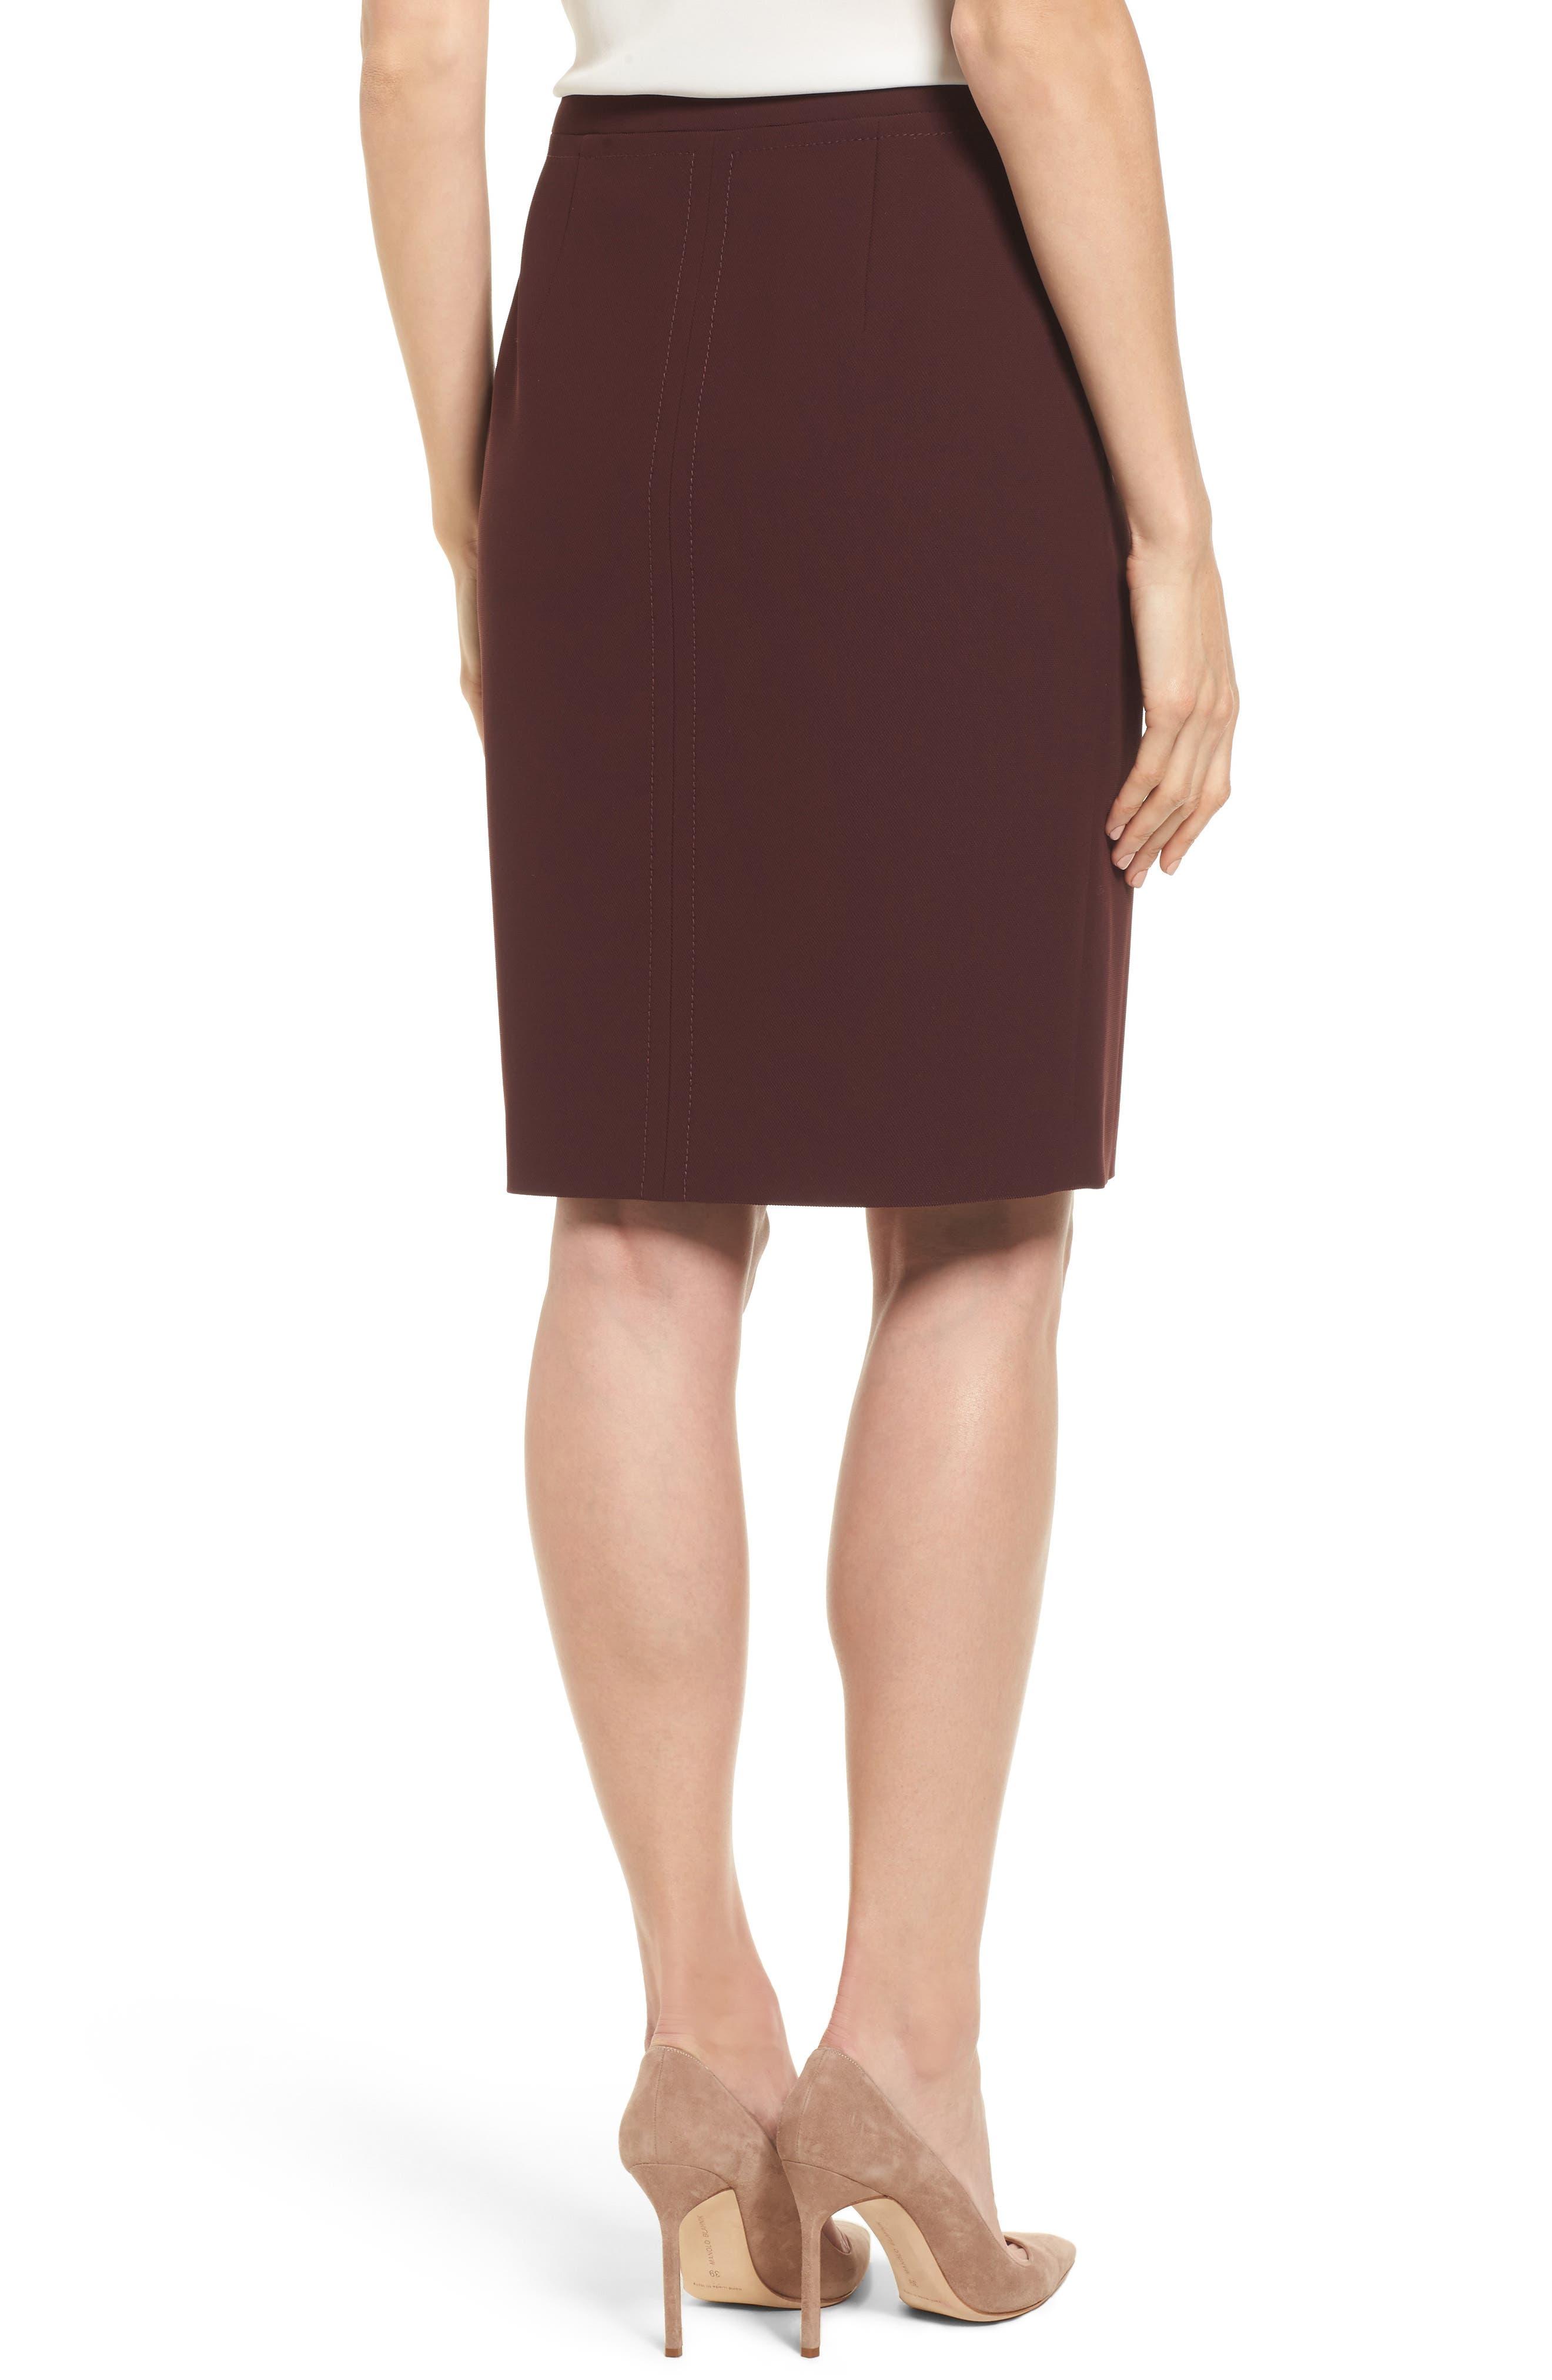 Vuriona Suit Skirt,                             Alternate thumbnail 2, color,                             Mulberry